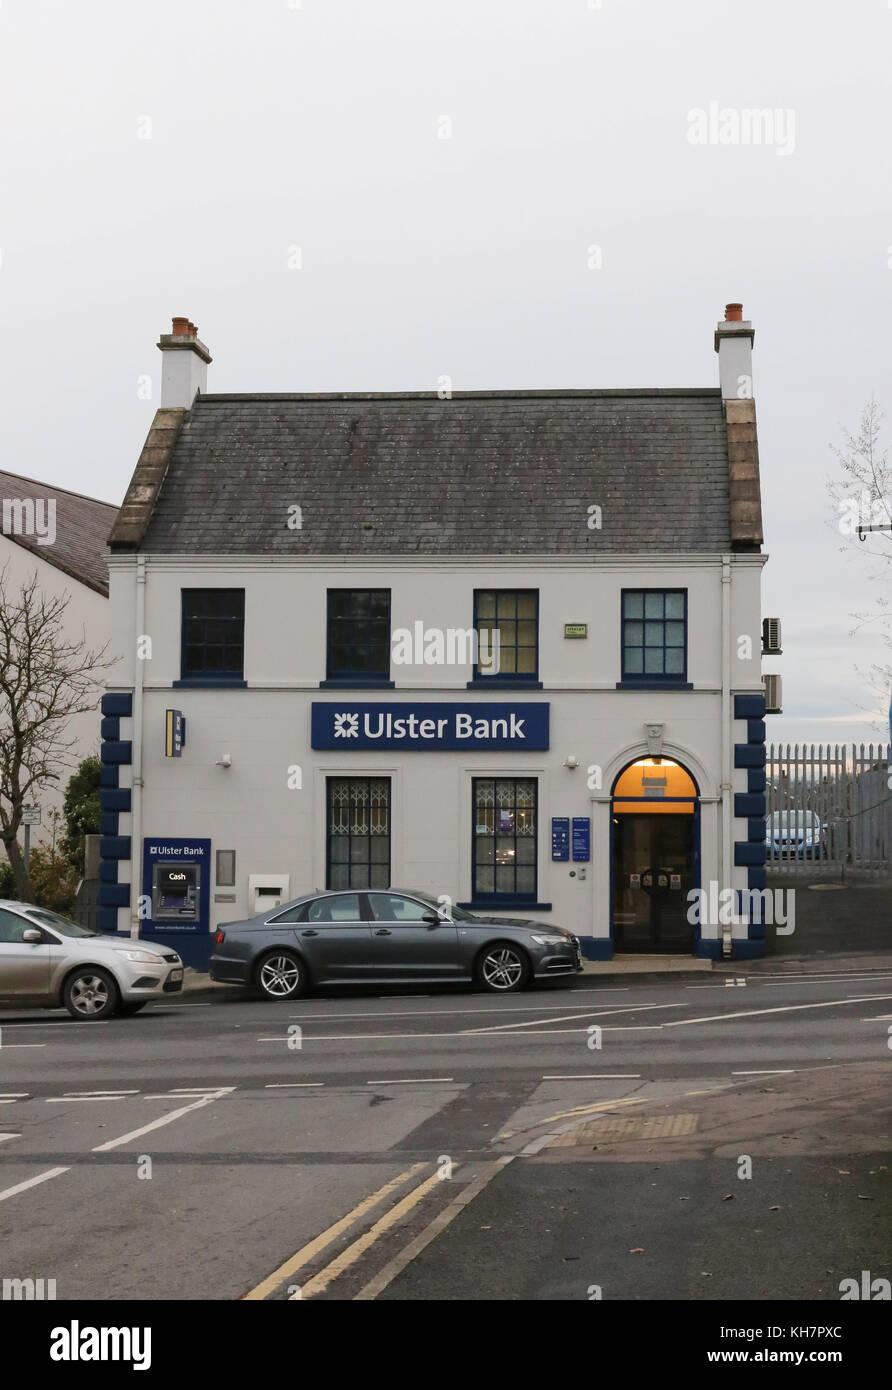 Moira Northern Ireland, UK. 15 November 2017. The Ulster Bank (part of The Royal Bank of Scotland Group) announced - Stock Image